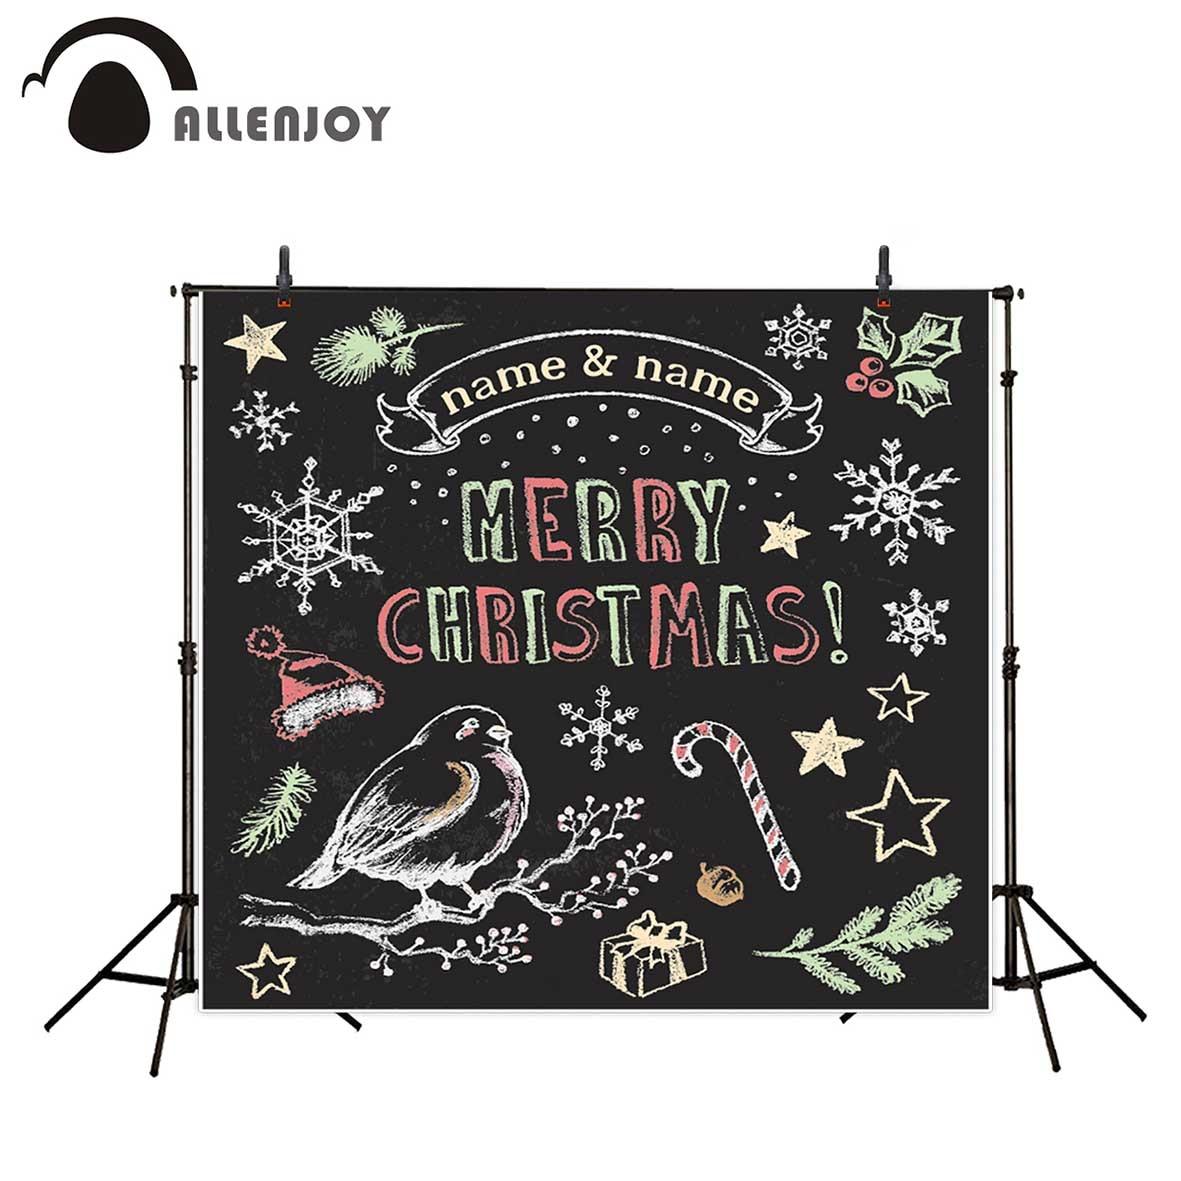 Allenjoy photography backdrop Christmas custom chalkboard bird gift snowflake background photocall photobooth photo studio allenjoy christmas photography backdrop wooden fireplace xmas sock gift children s photocall photographic customize festive